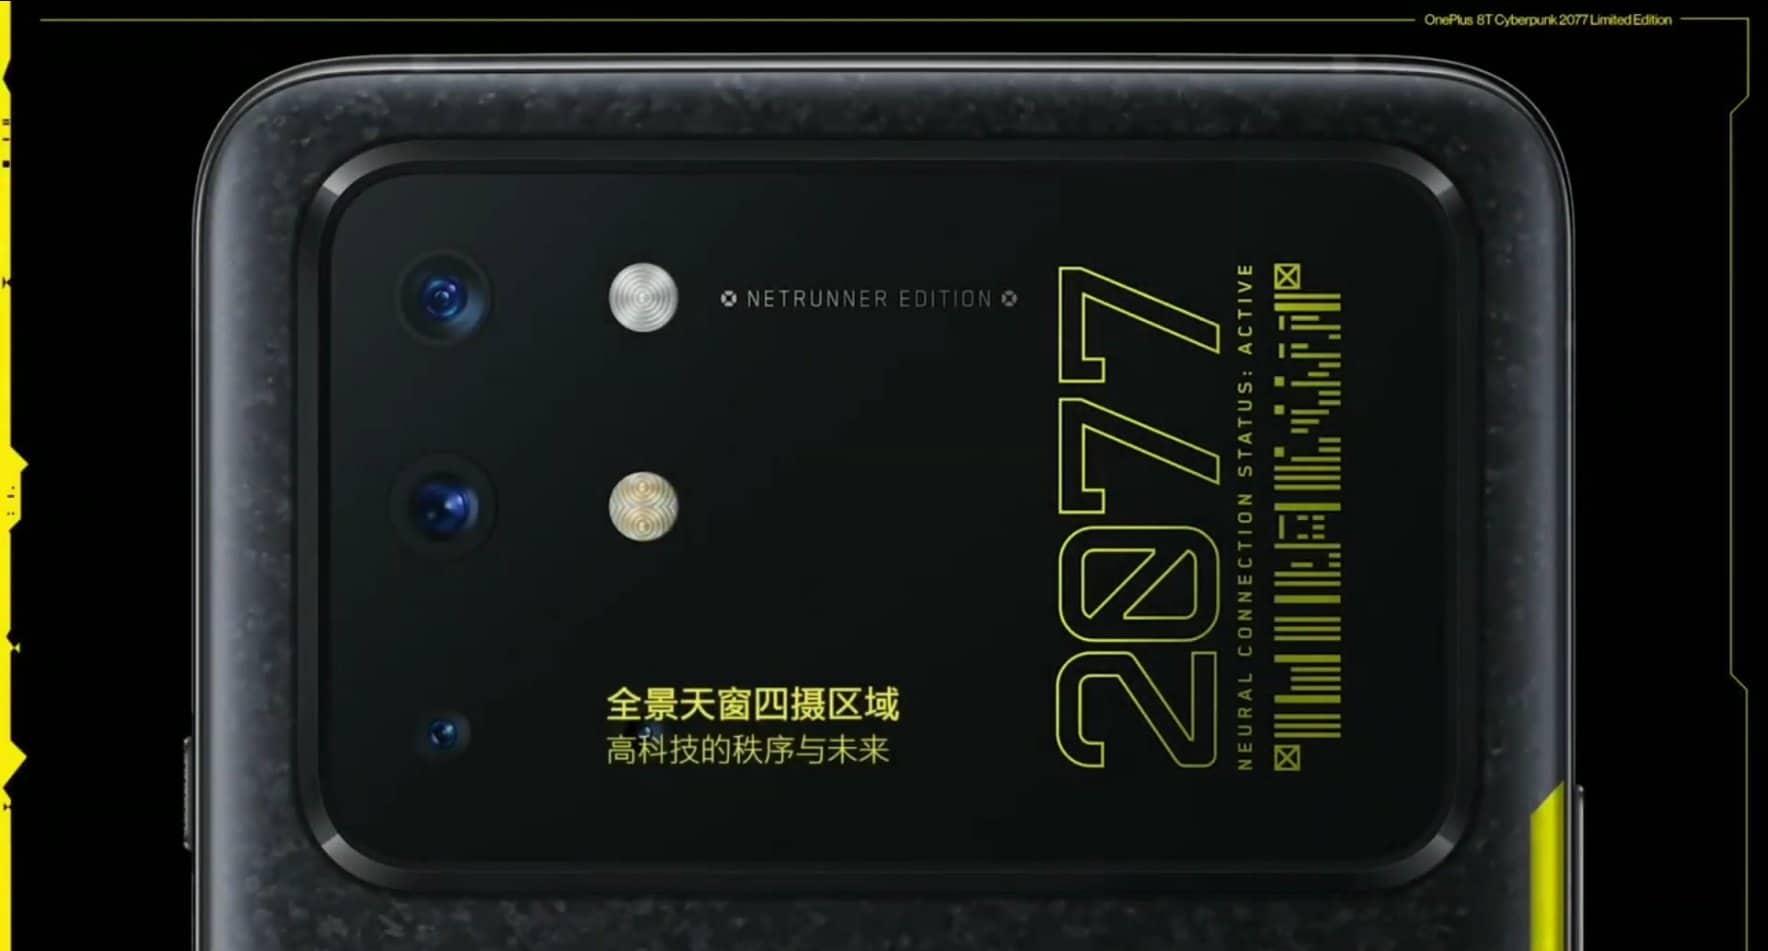 OnePlus 8T Cyberpunk 2077 image 7